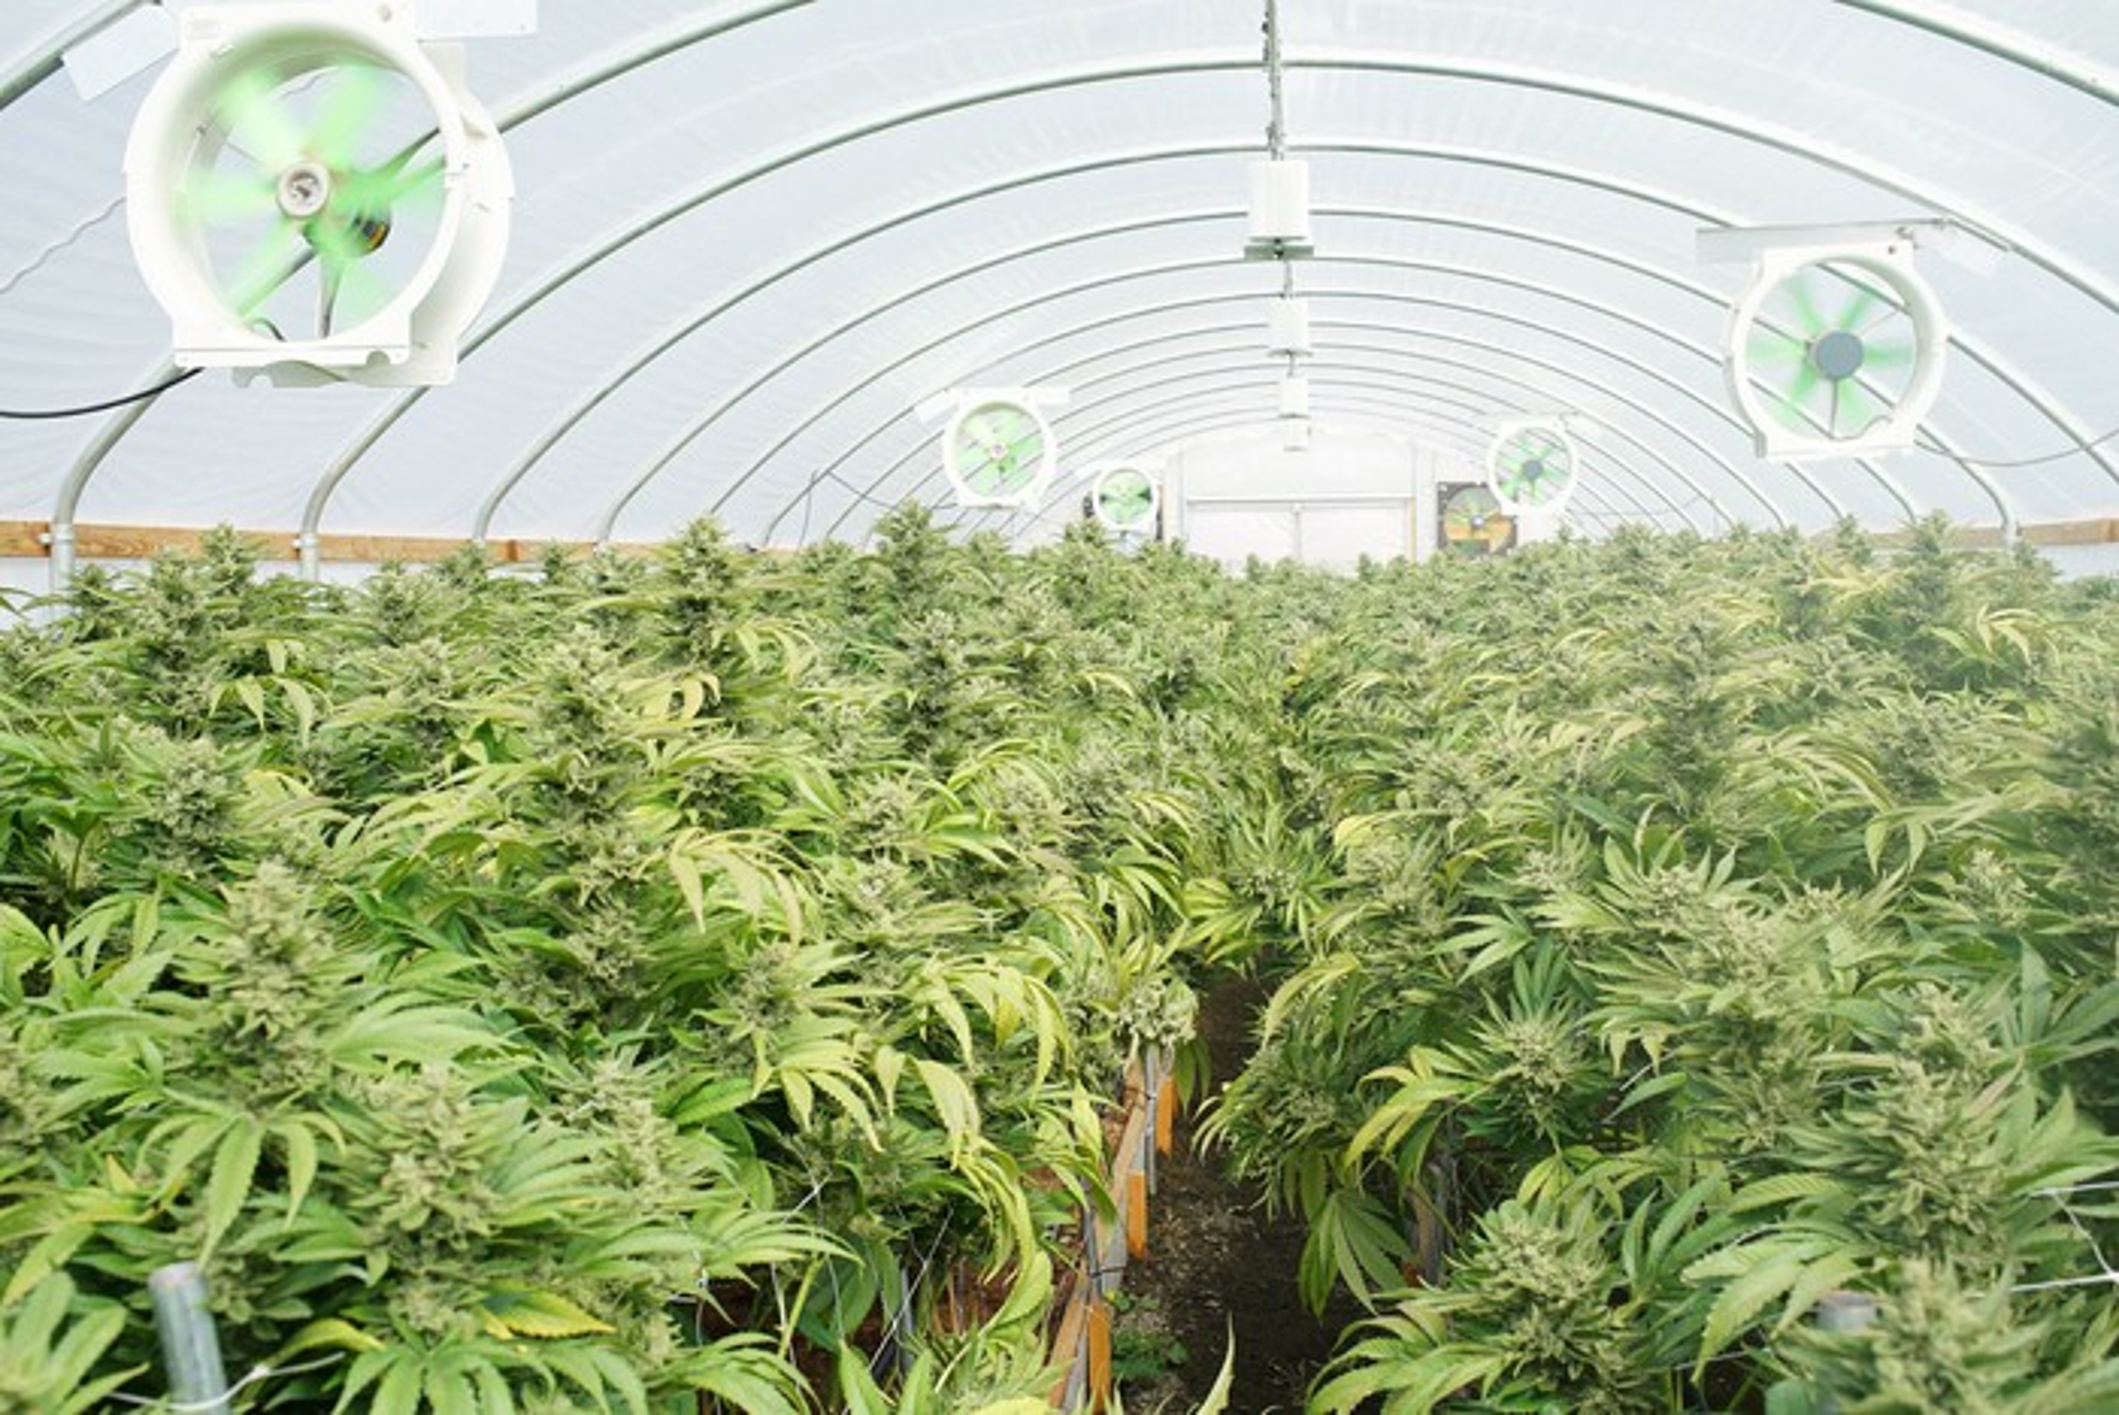 An indoor cannabis-growing greenhouse